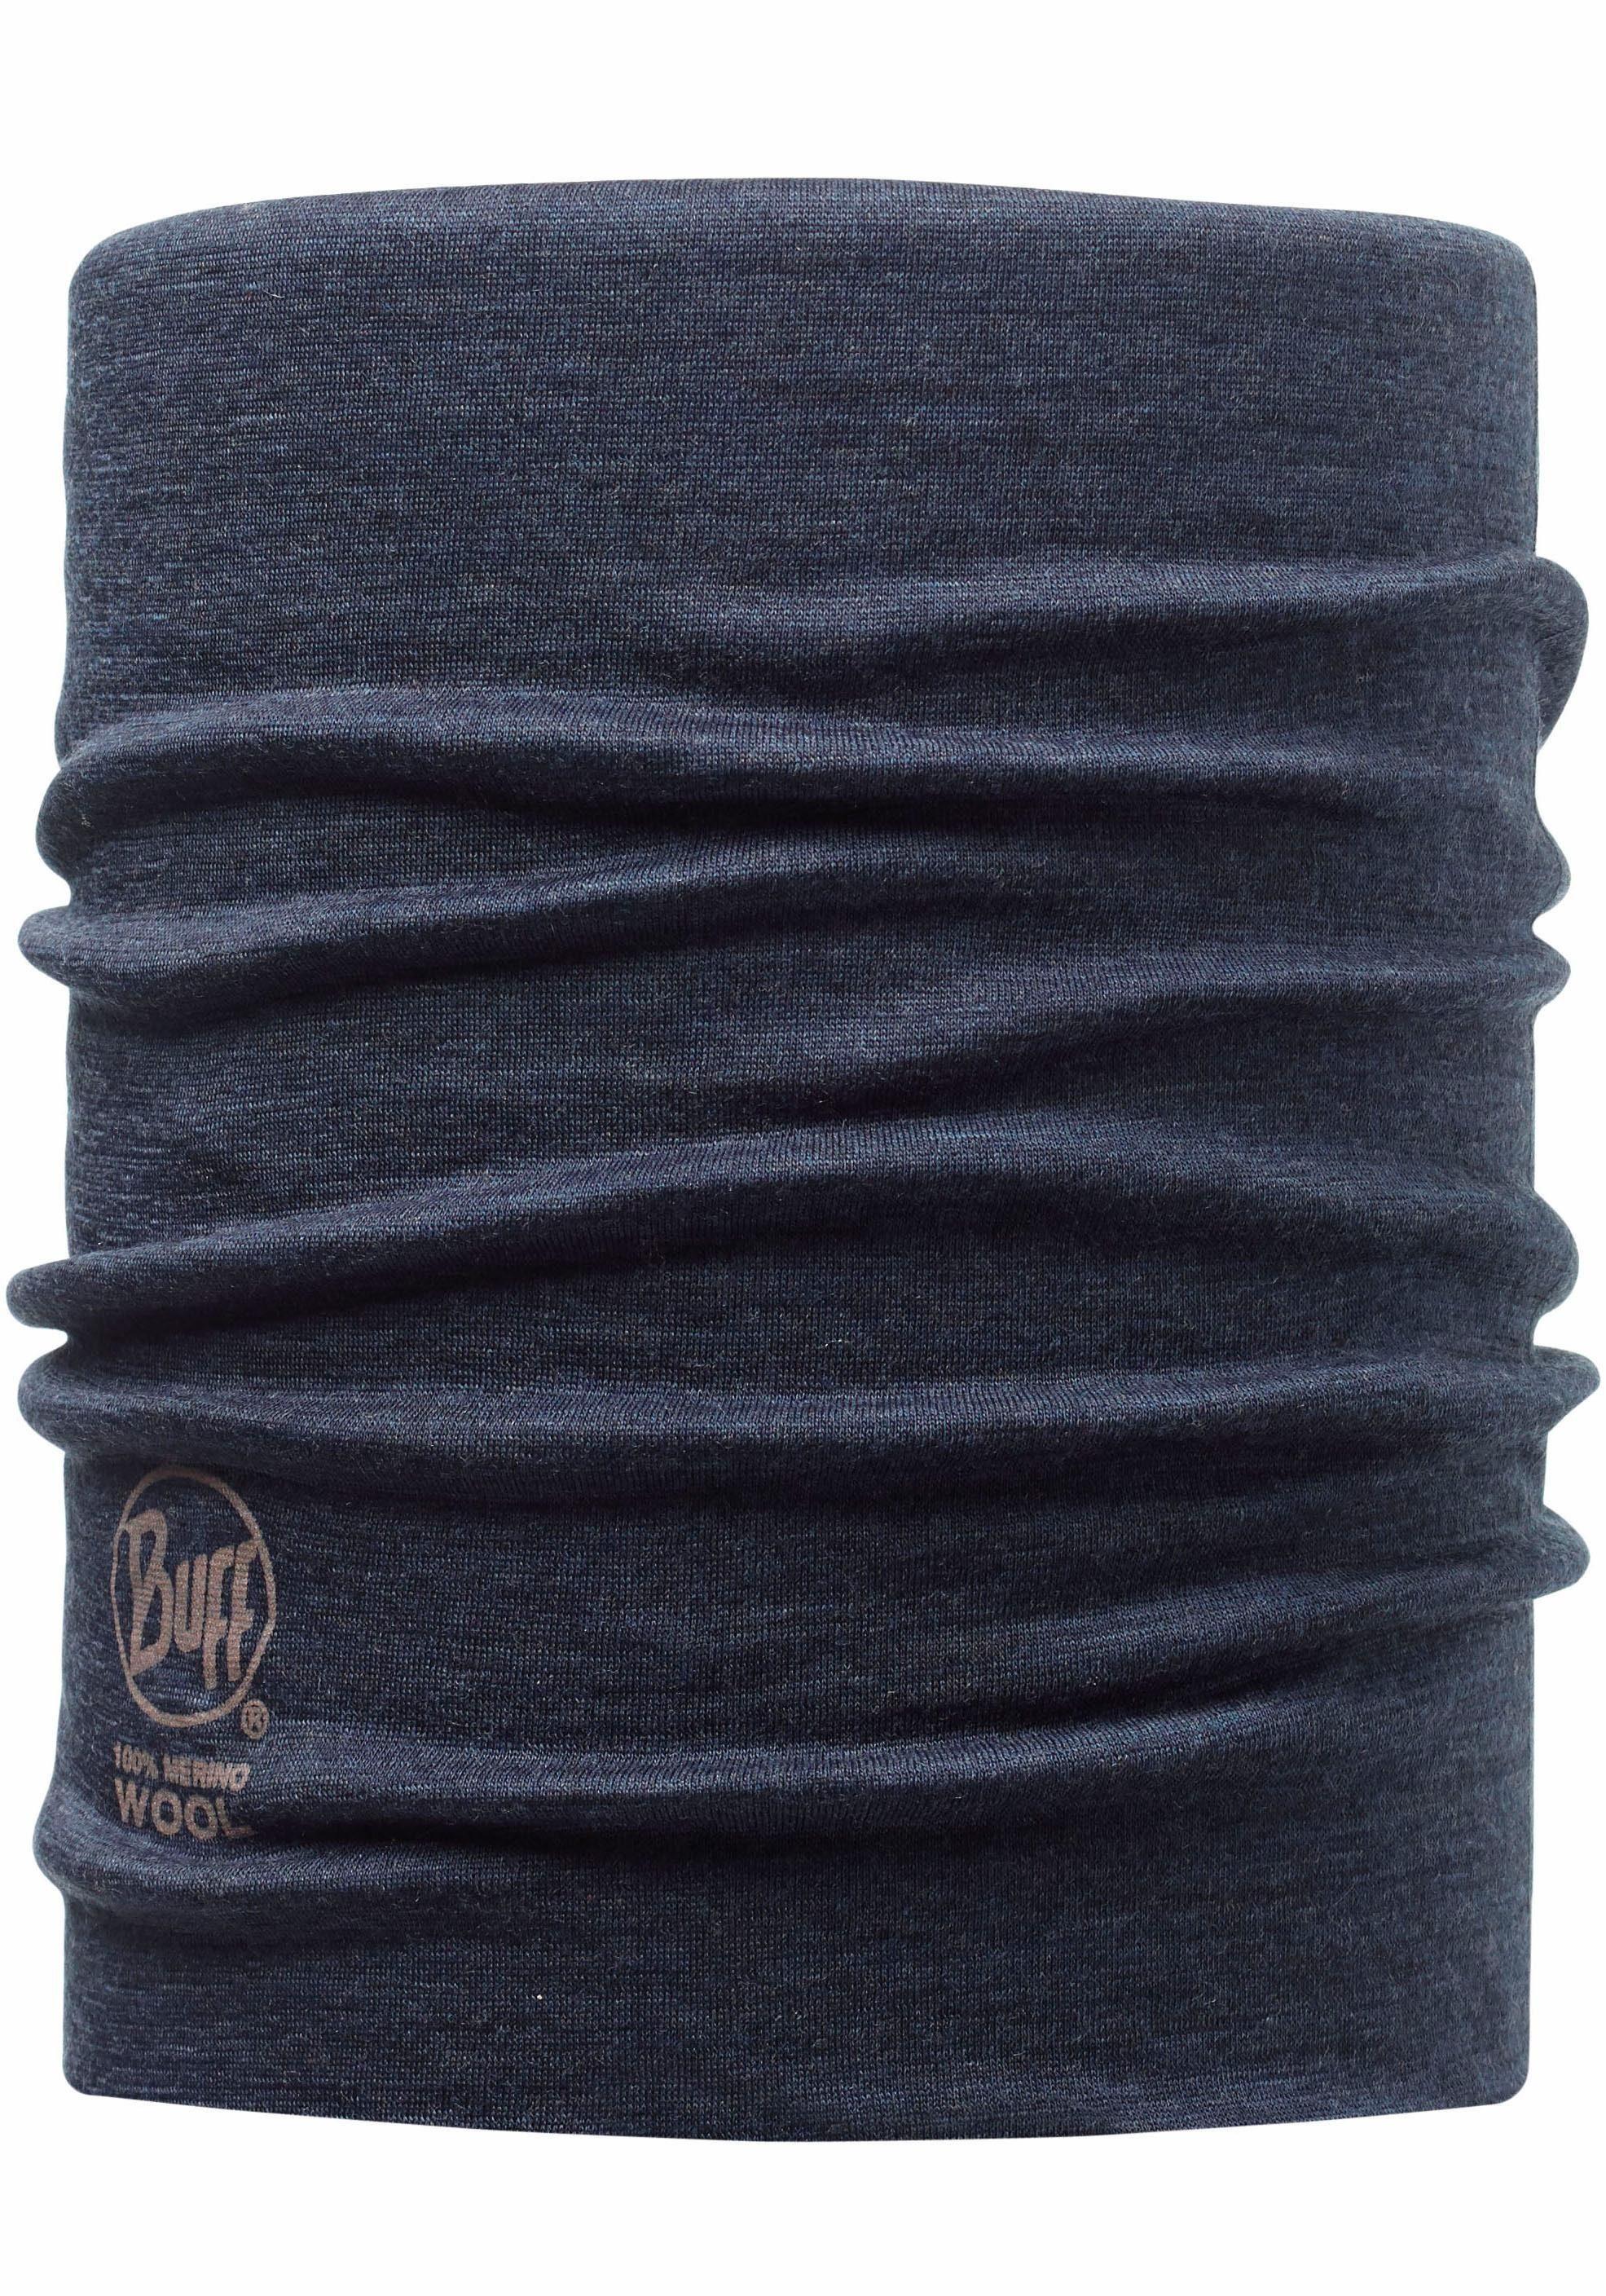 Buff Multifunktionstuch »Merino Wool Neckwarmer Buff®« Hals- oder Kopftuch